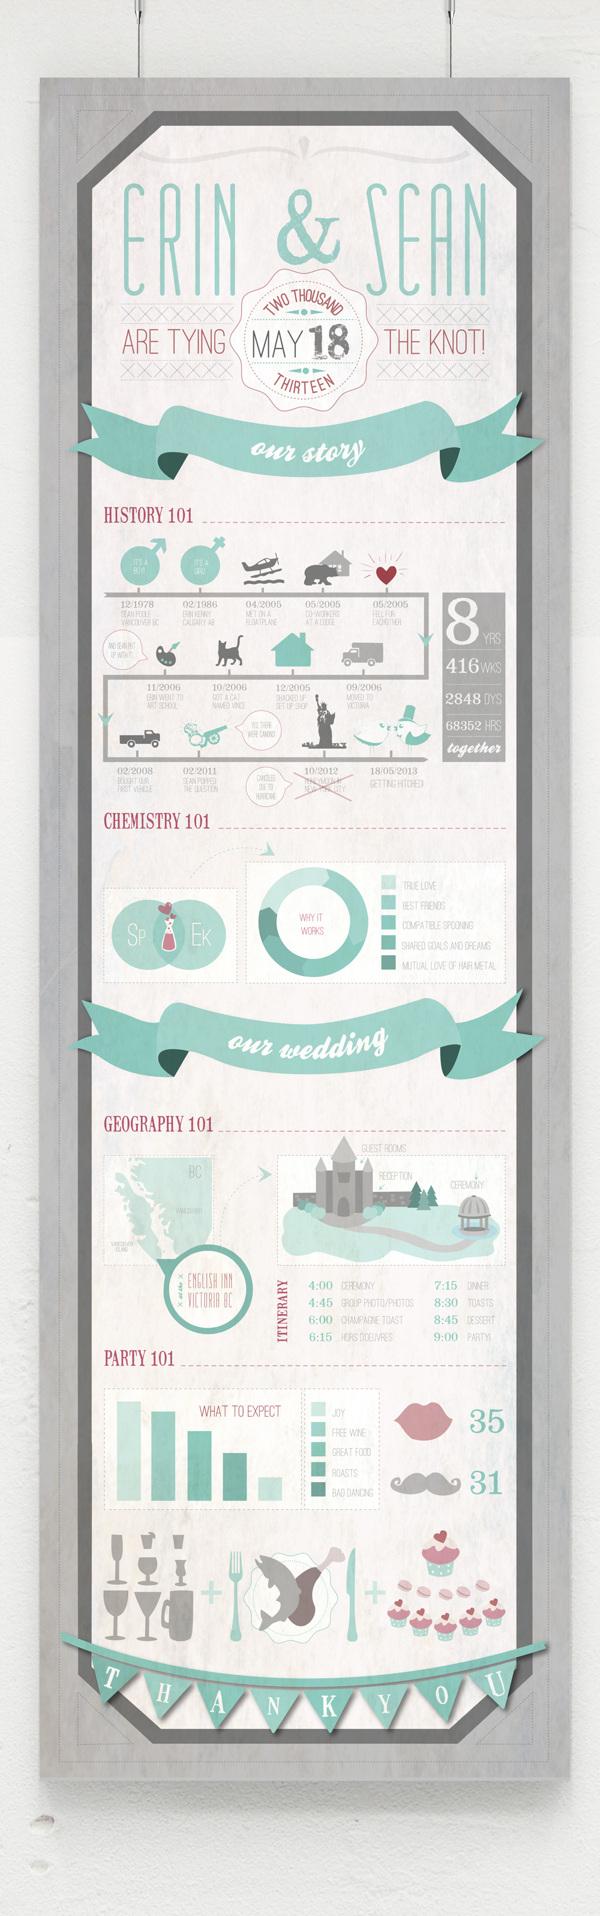 #infographic  Wedding Infographic [ Erin + Sean 2013 ] by Erin Kenny, via Behance